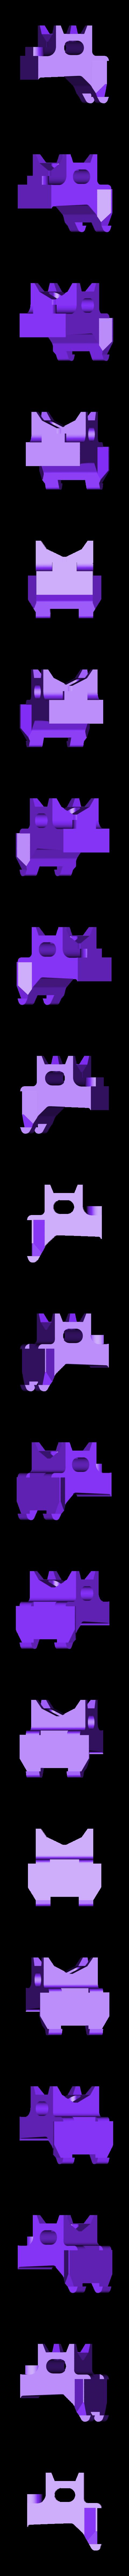 Front_Engine_-_Part_2.STL Download free STL file 4-8-8-4 Big Boy Locomotive • 3D printer object, RaymondDeLuca